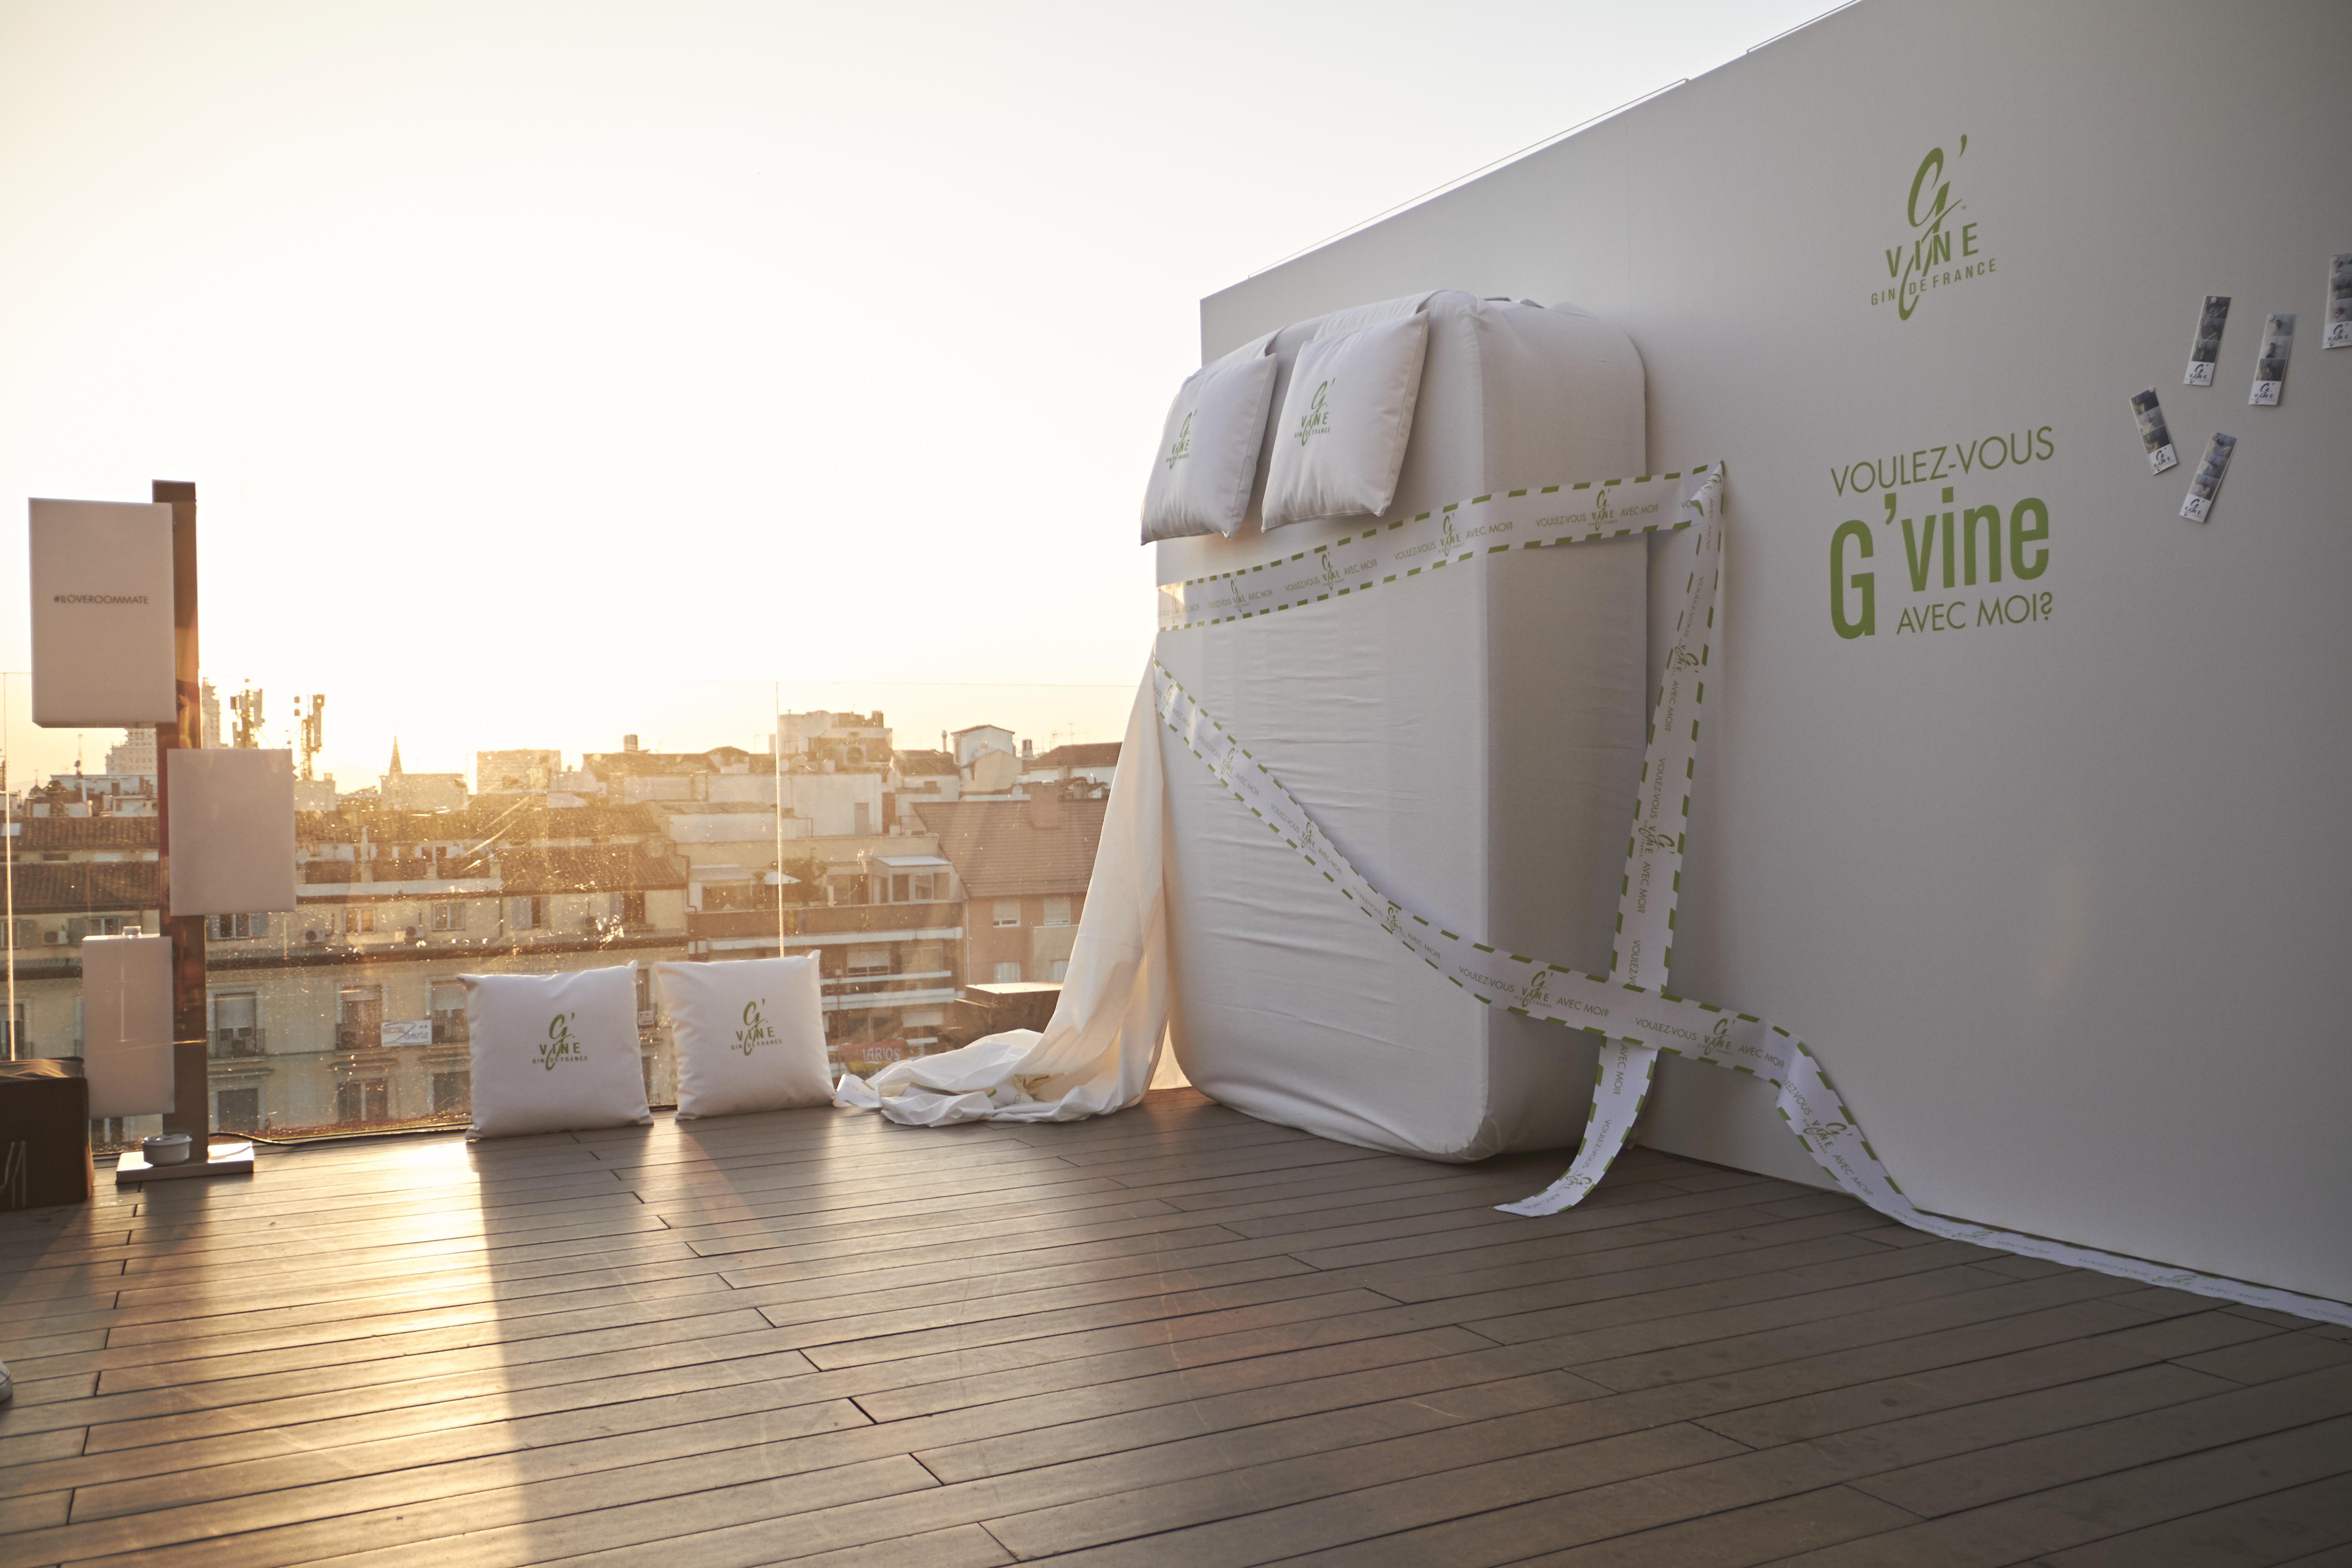 G'Vine celebra la noche más  canalla del verano bajo el  lema VOULEZ-VOUS G'VINE AVEC MOI?